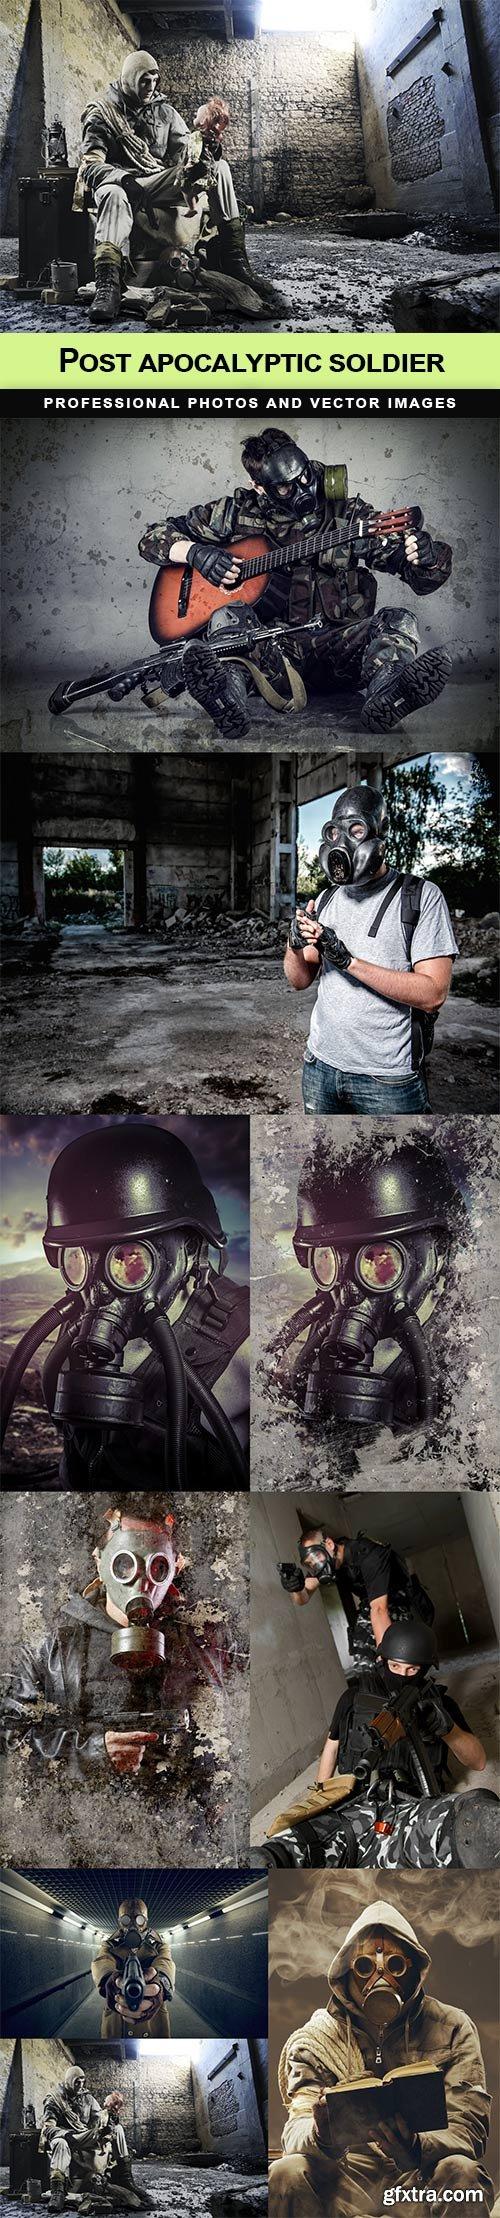 Post apocalyptic soldier - 9 UHQ JPEG